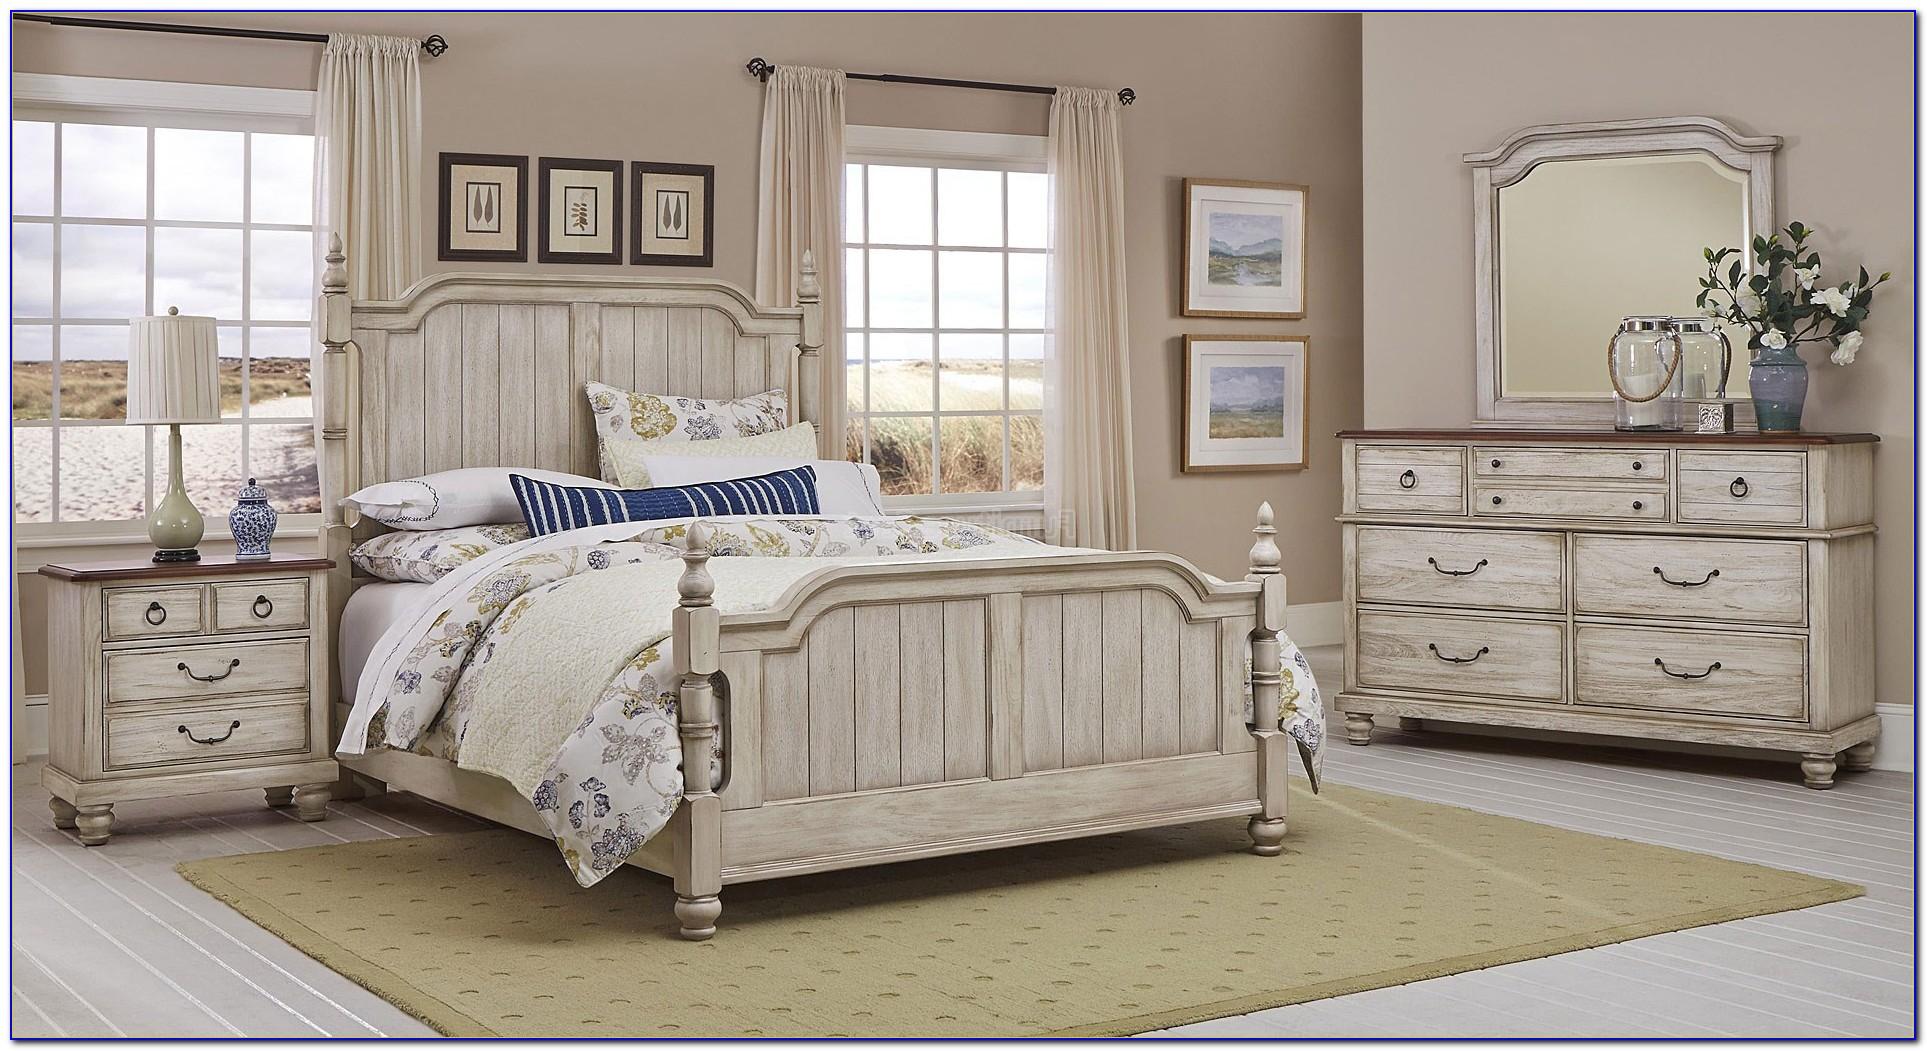 White Rustic Bedroom Sets - Bedroom : Home Design Ideas #dKYd96RkRQ